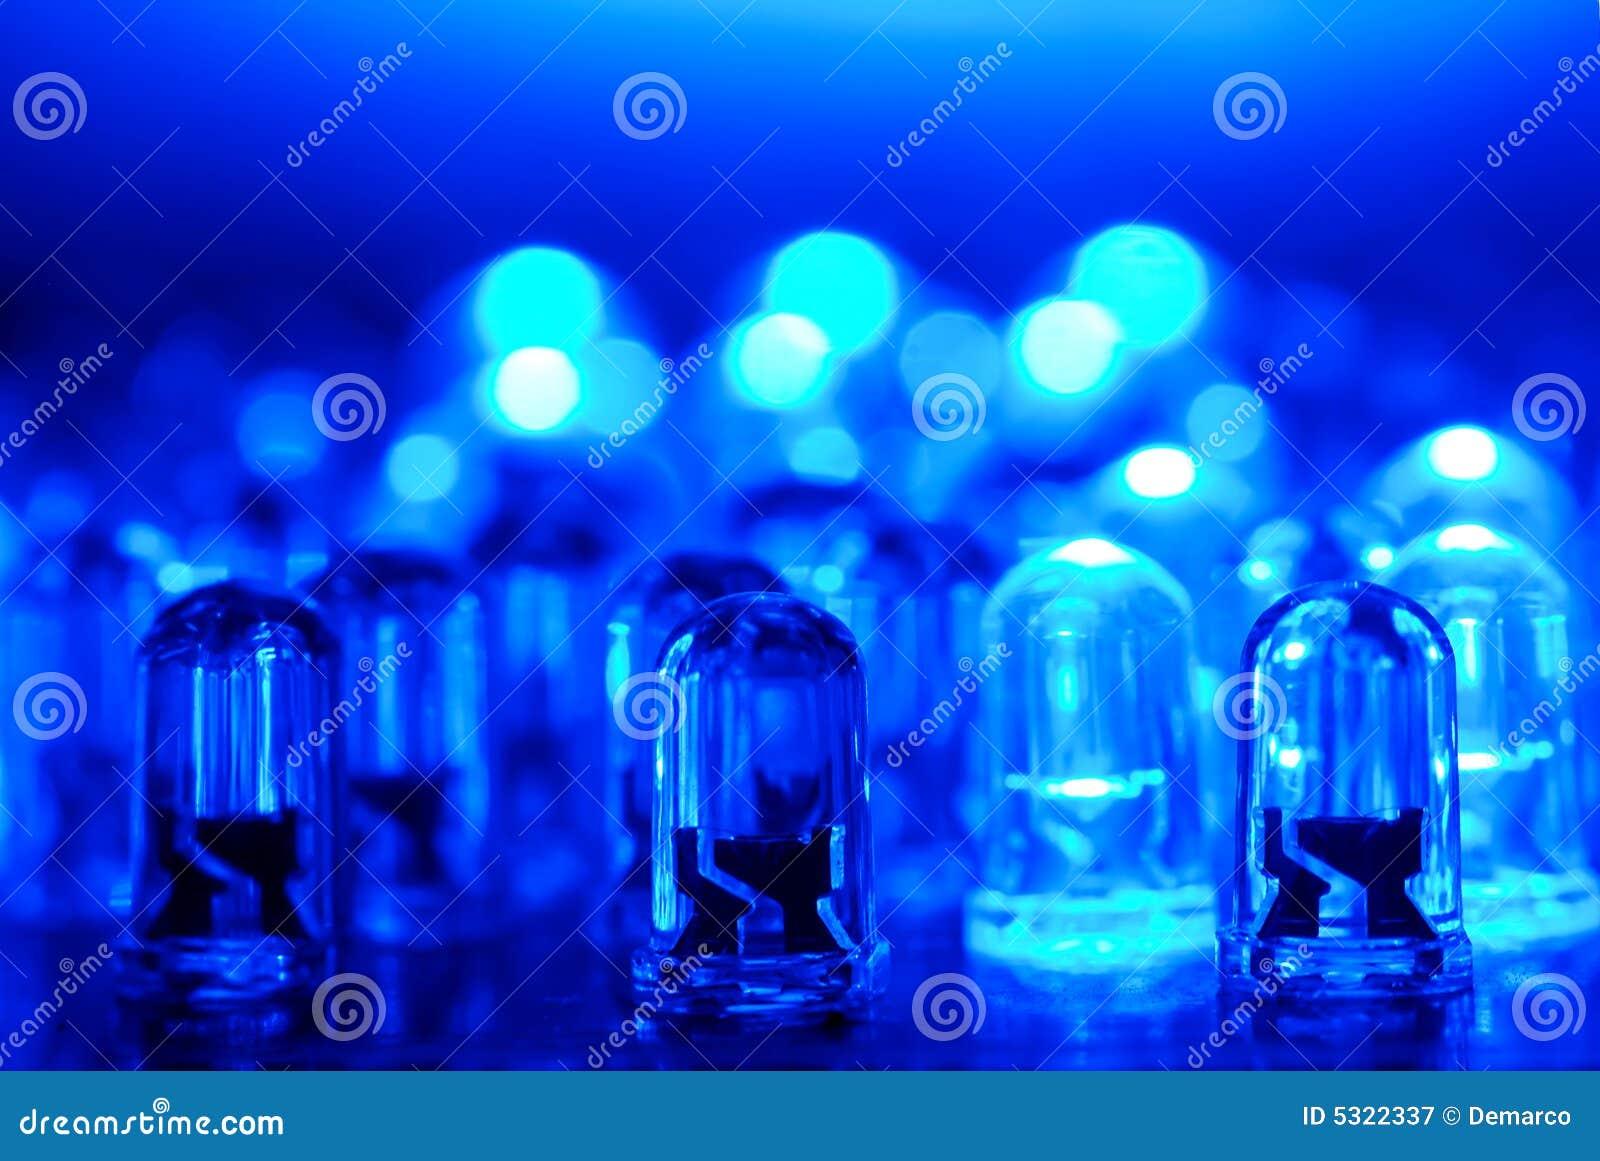 Download LED blu immagine stock. Immagine di lampada, piombo, lampadina - 5322337